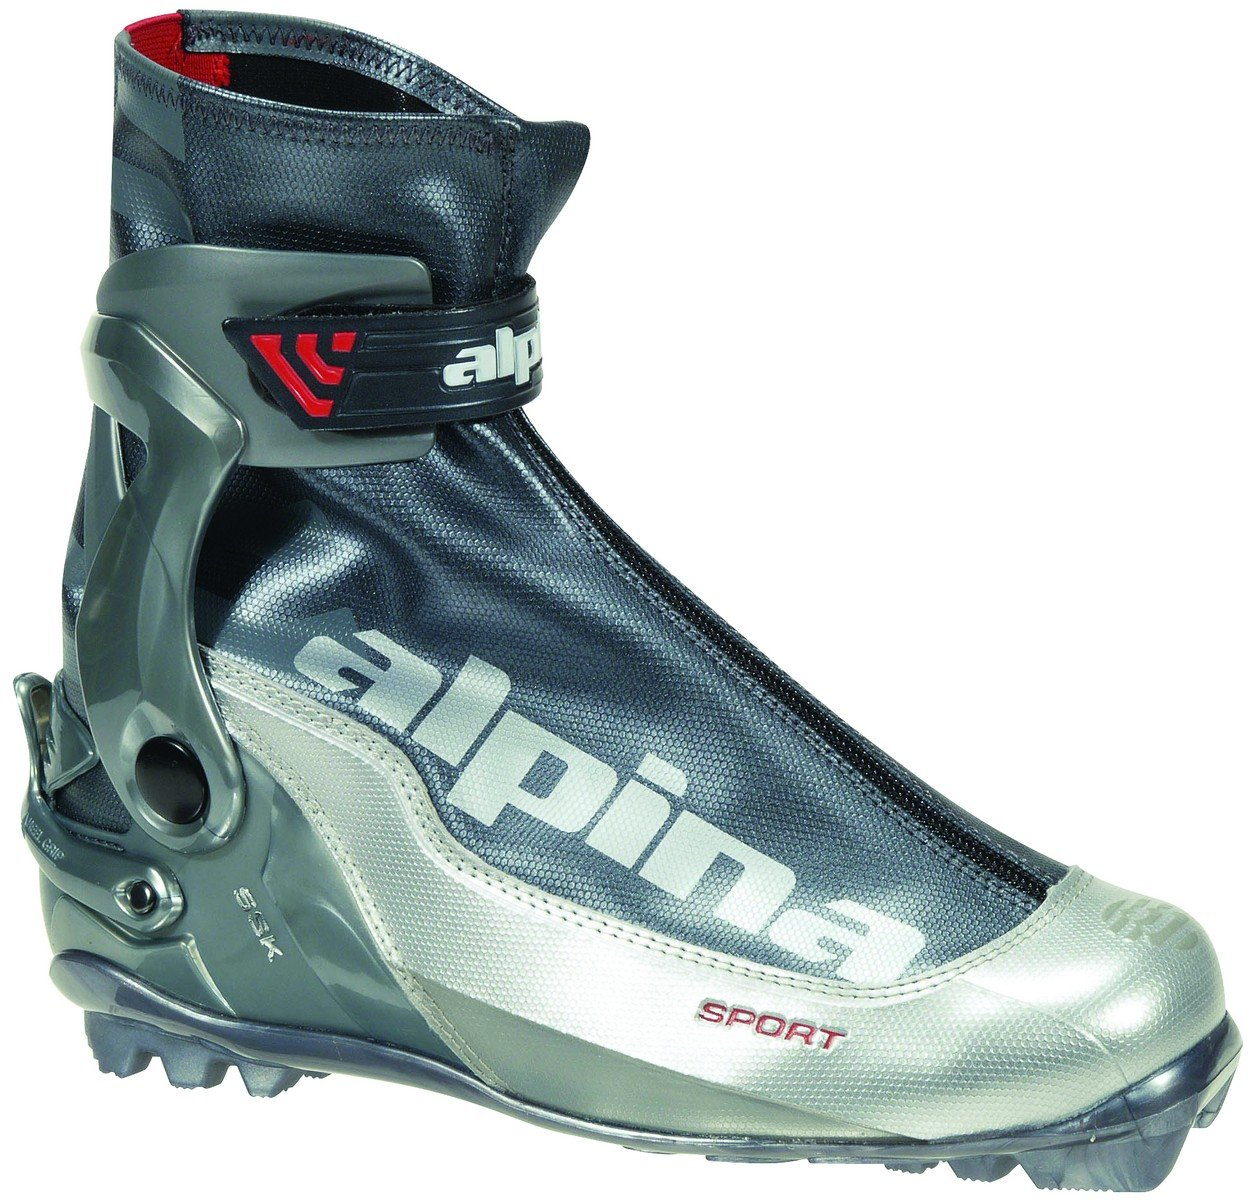 Amazoncom Alpina SSK Sport Series CrossCountry Nordic Skate Ski - Alpina skate ski boots